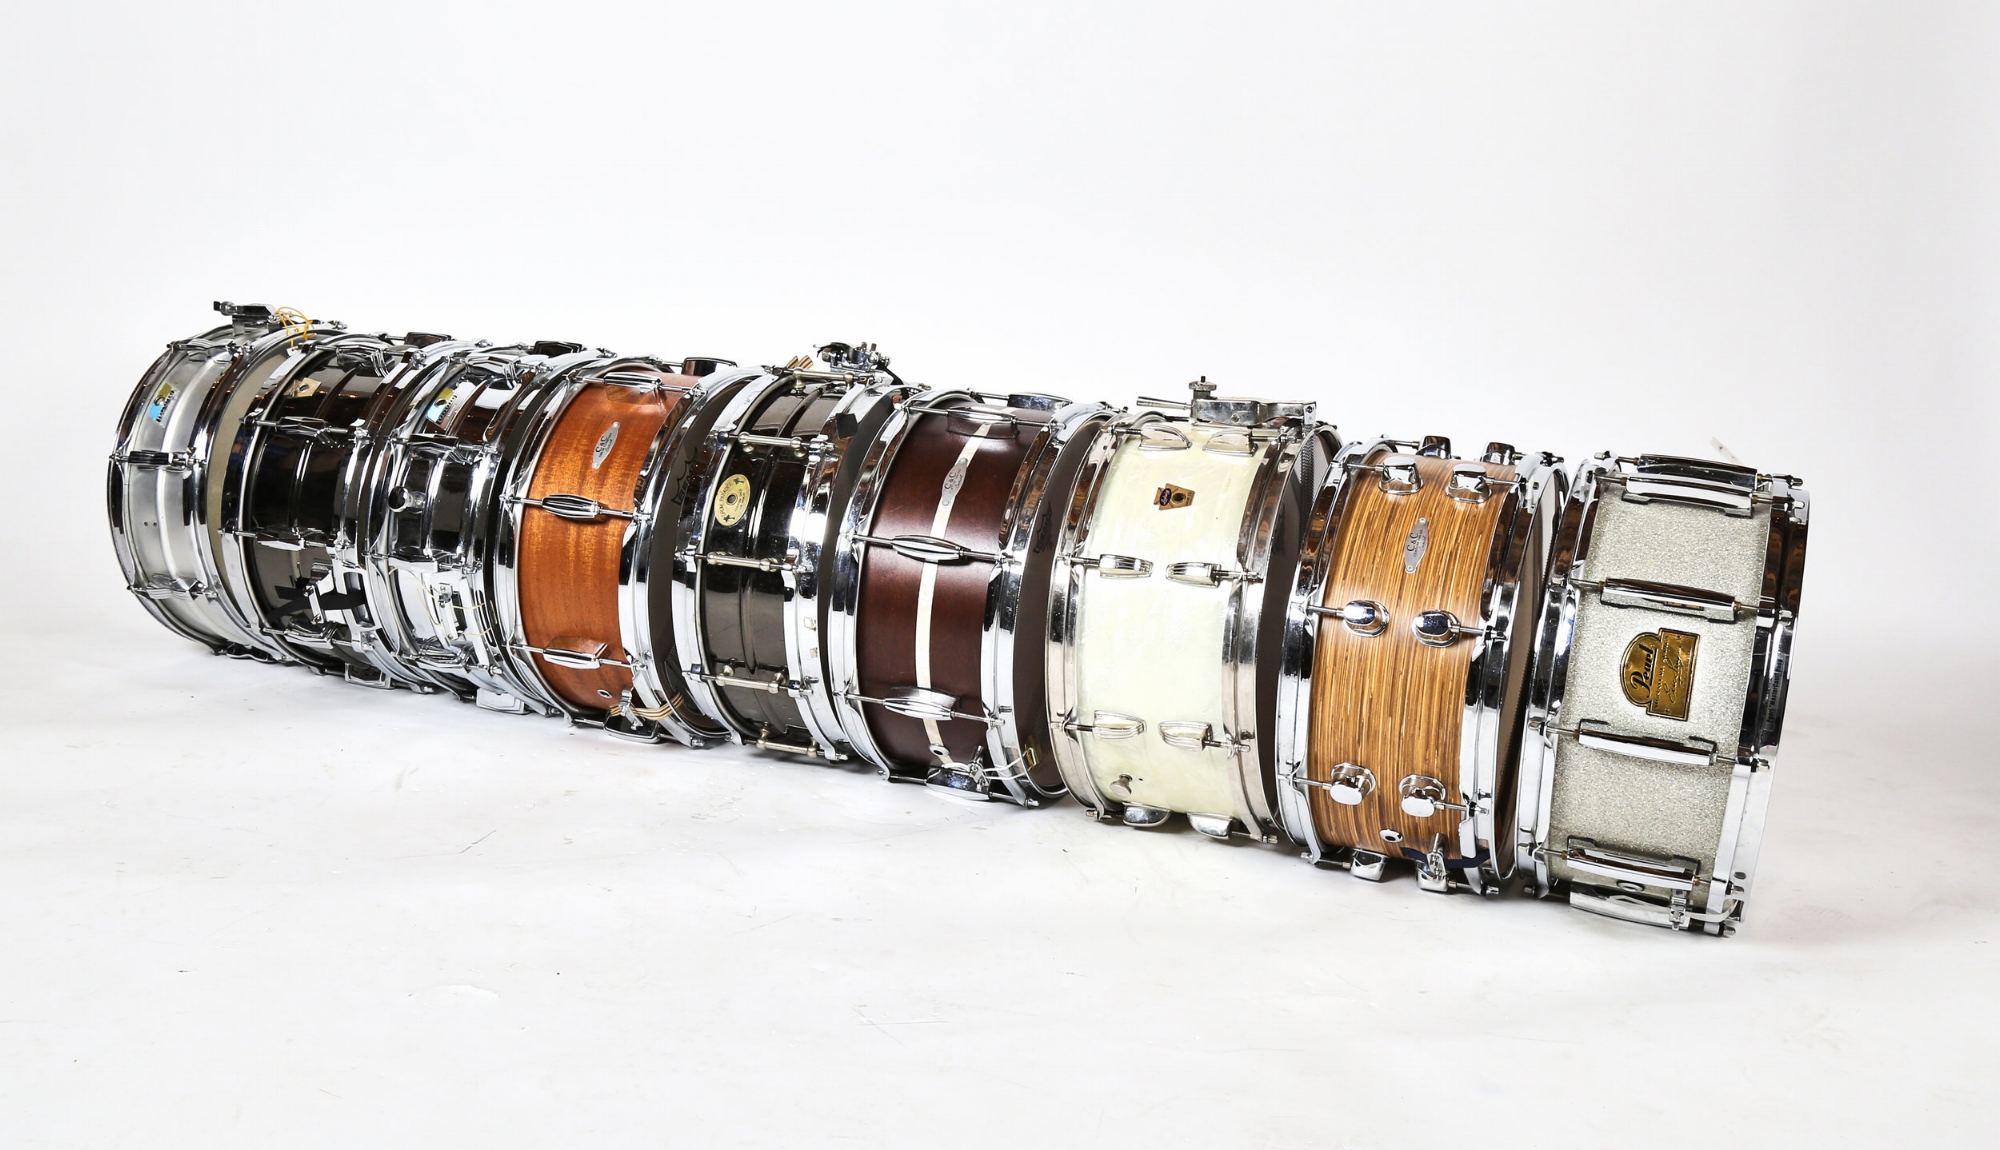 Dorio Vintage Drum_Snare Line_1895.jpg